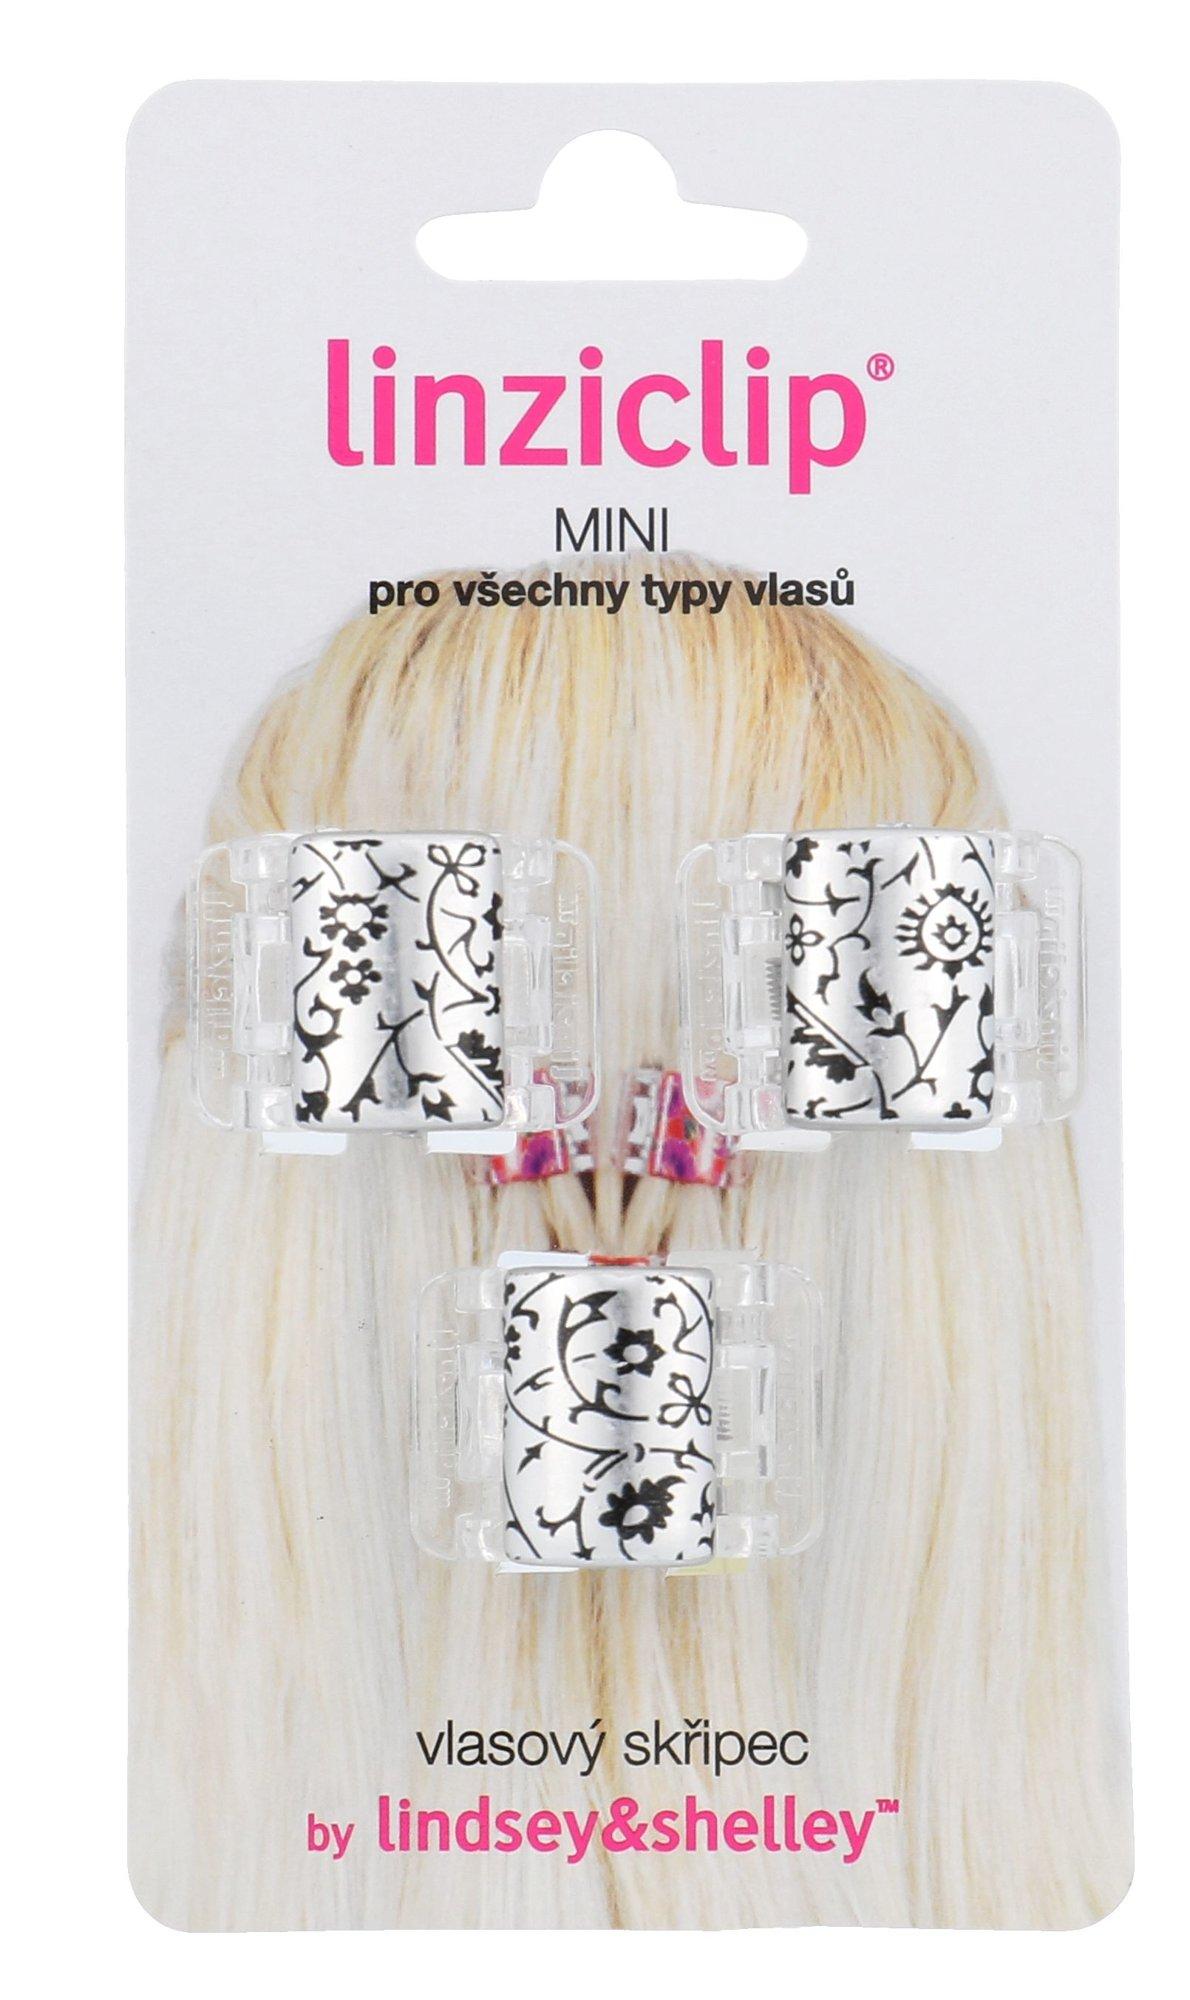 Linziclip Mini Cosmetic 3ml Silver Metallic Floral